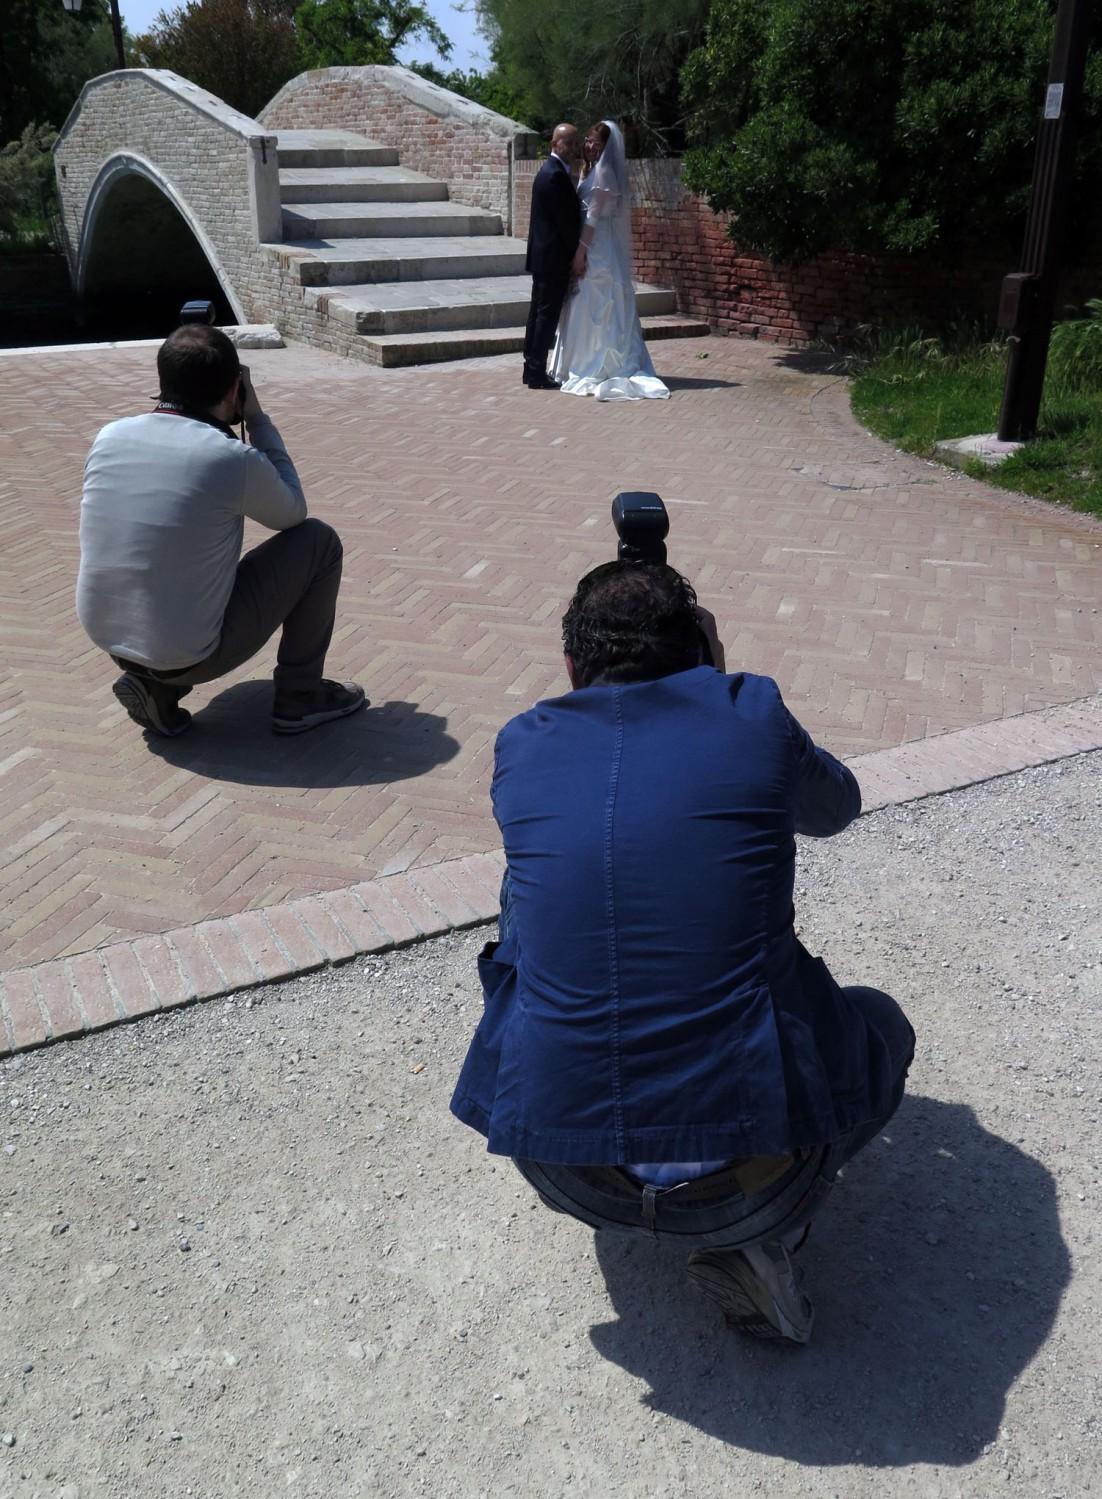 Italy-Venice-Islands-Torcello-Wedding